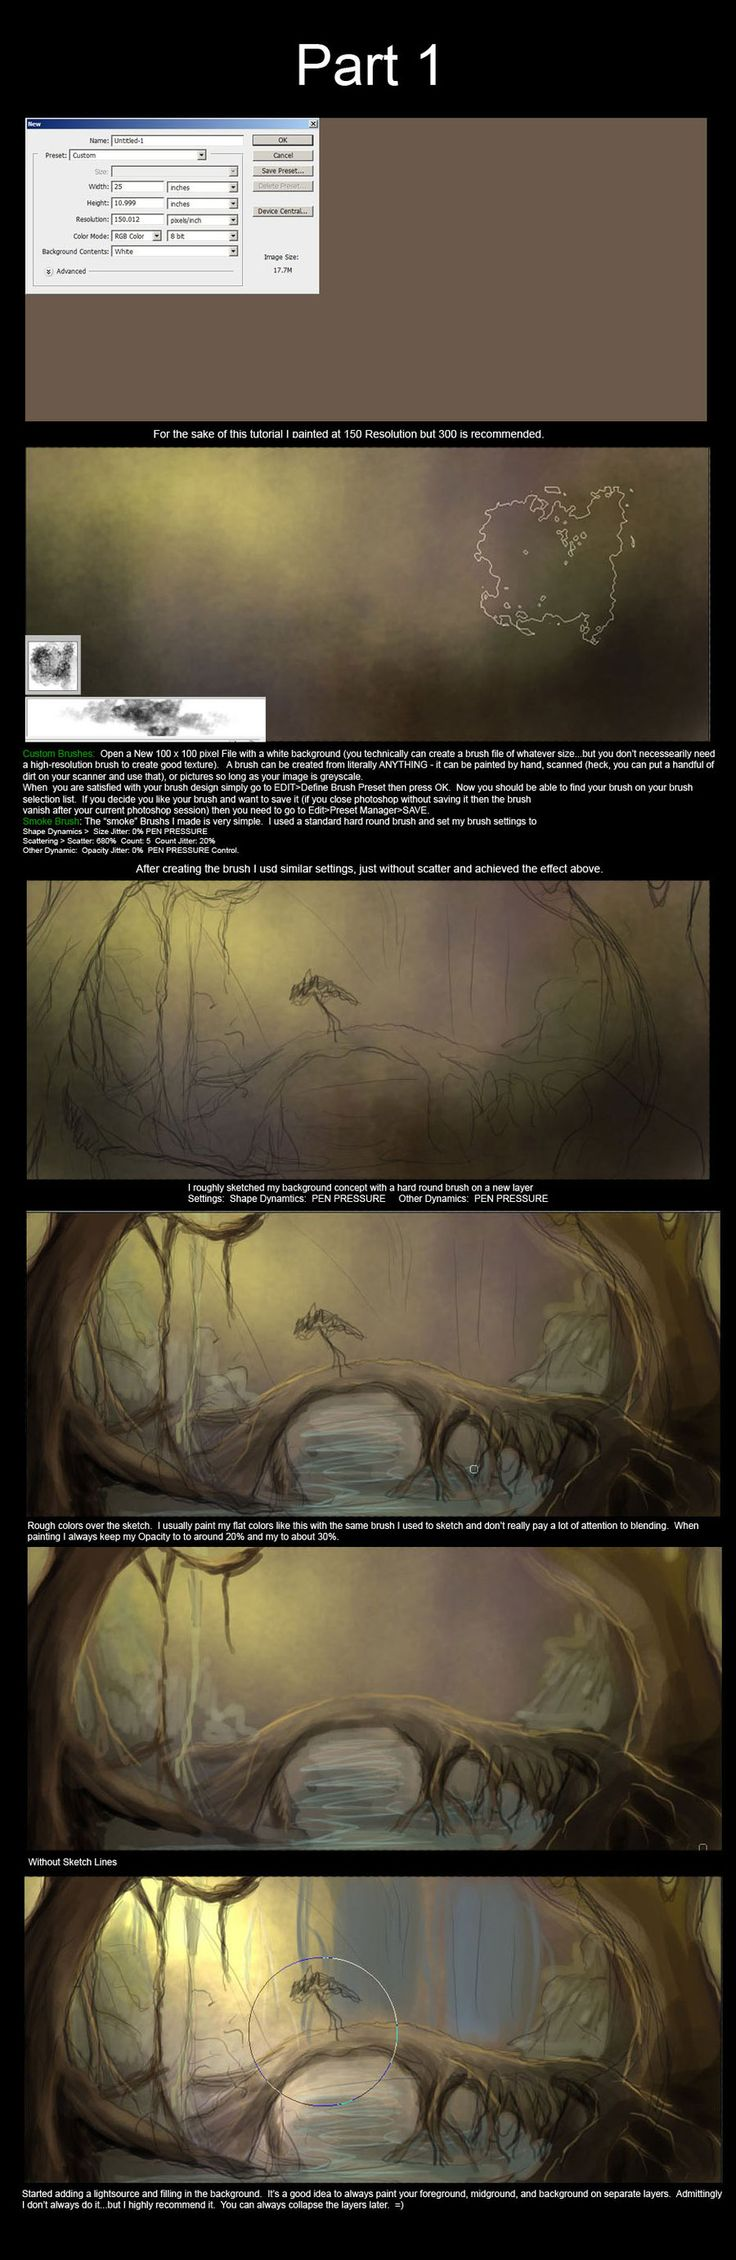 Forest Tutorial Part 1 by Lunar-lce.deviantart.com on @deviantART